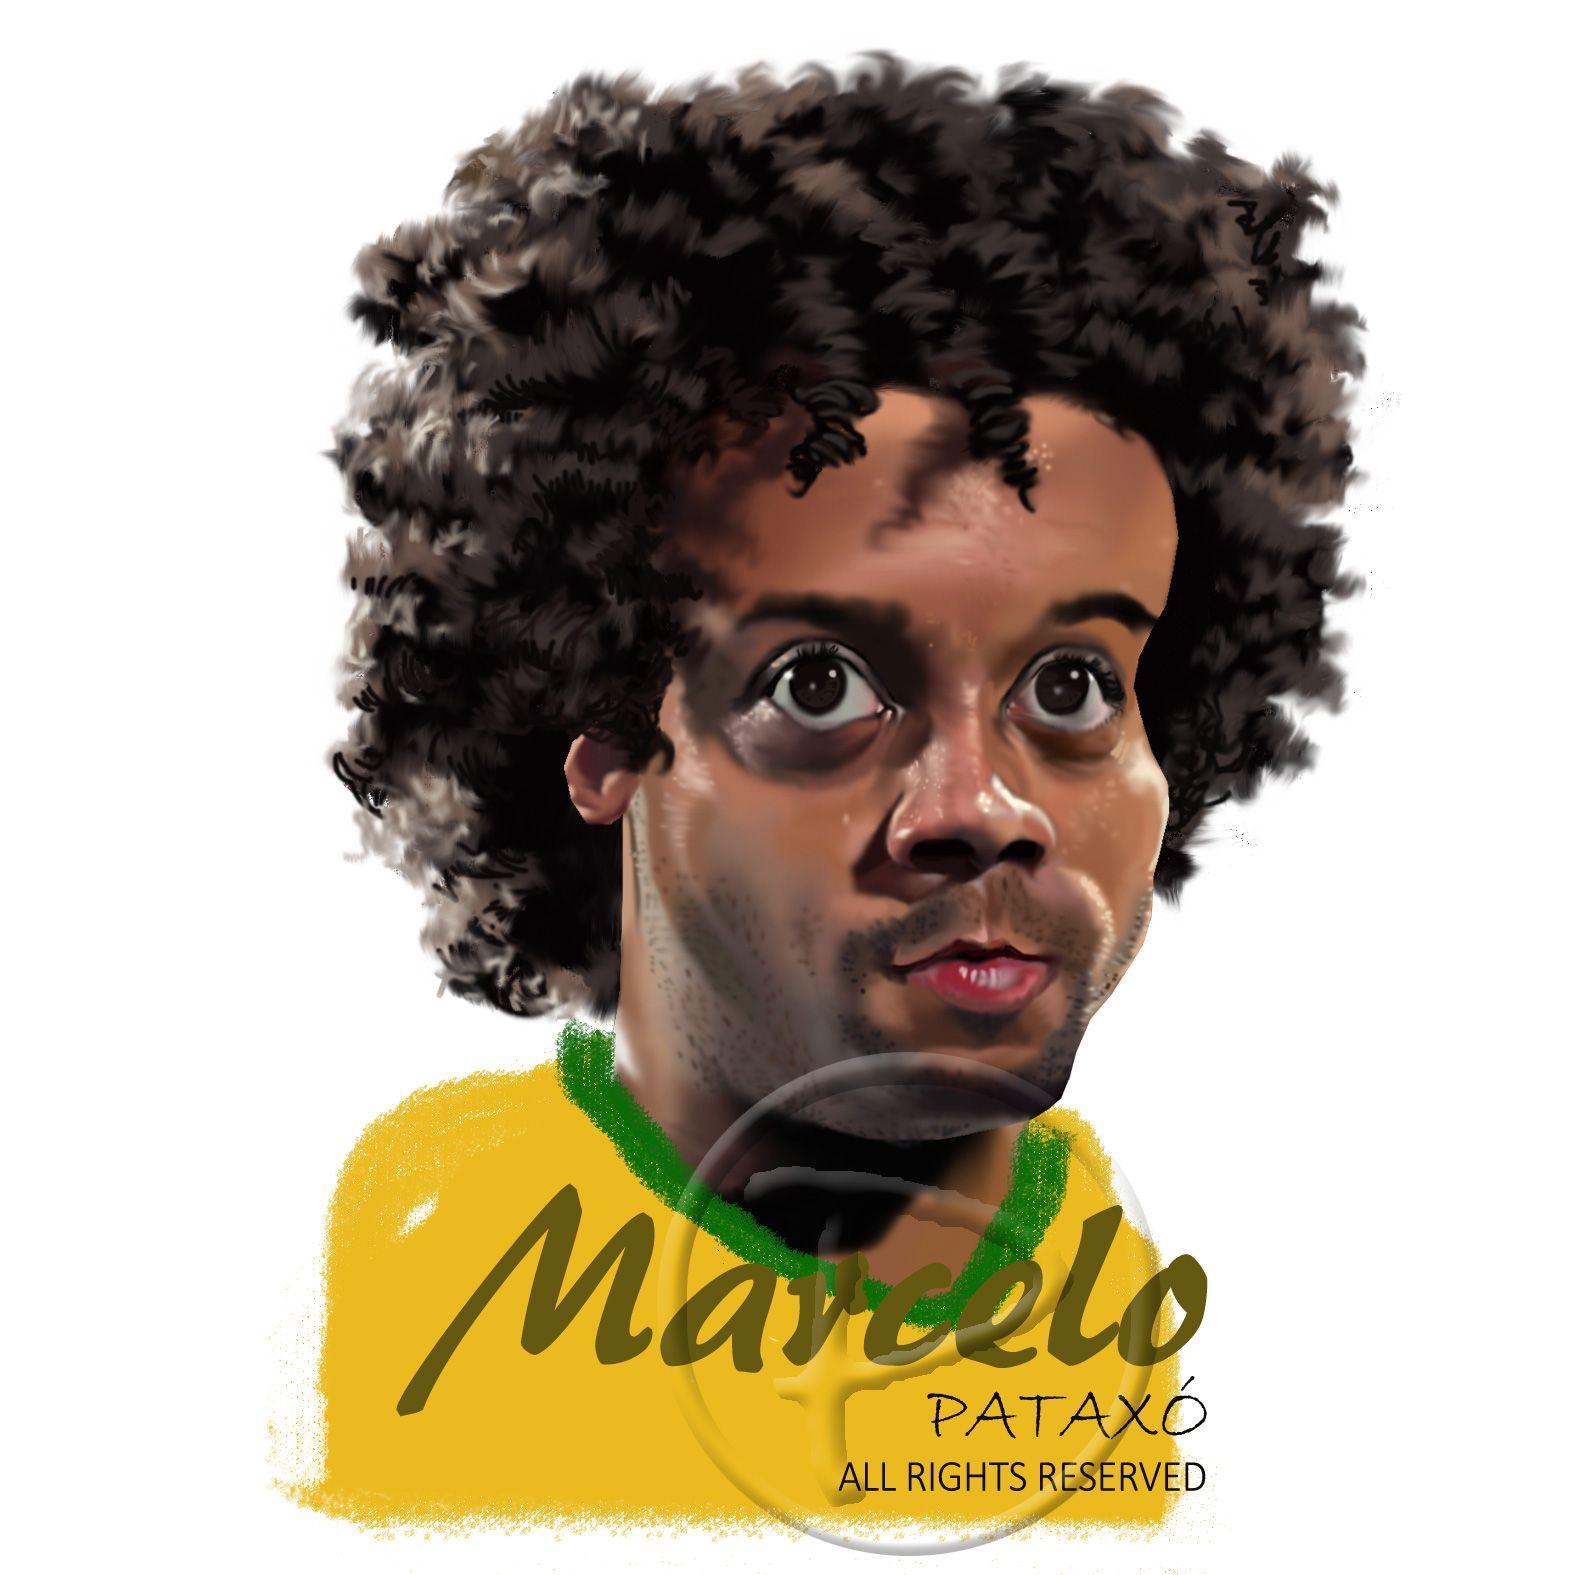 Marcelo, brazilian football player.